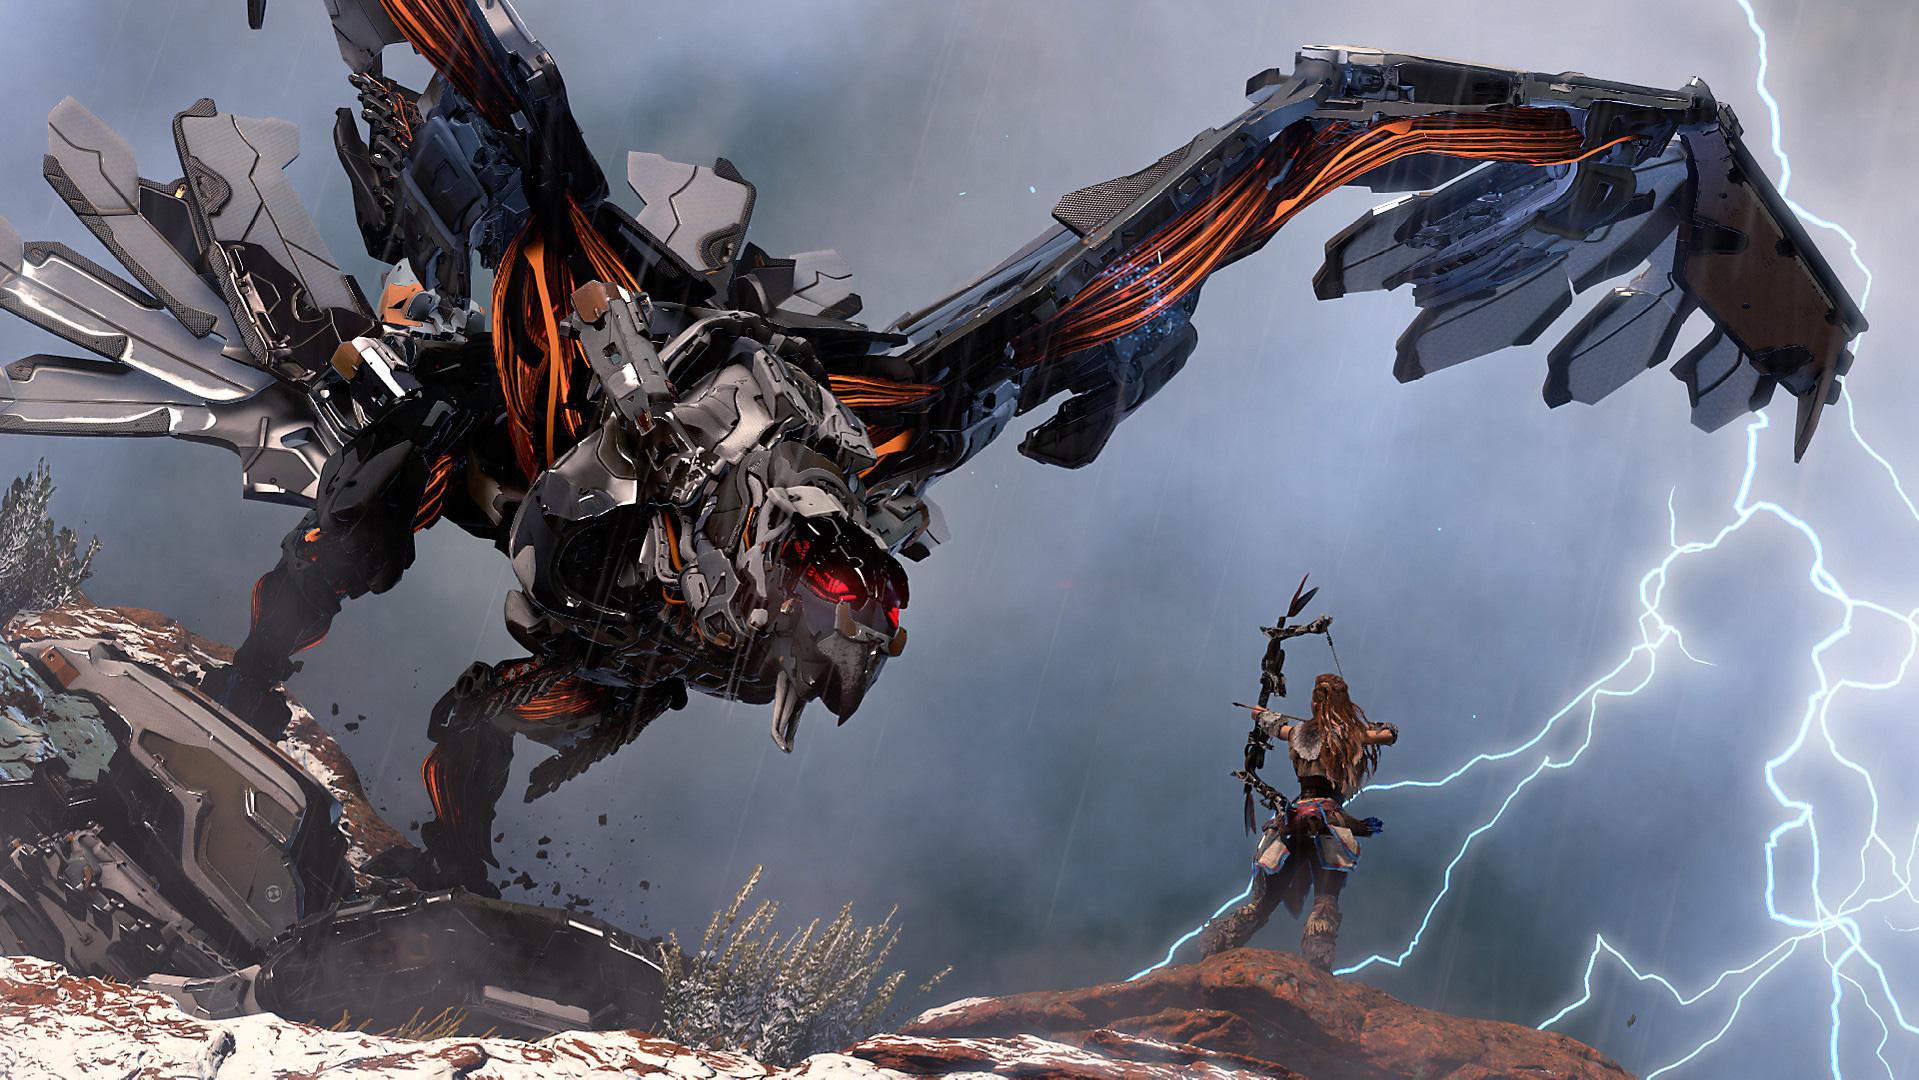 Horizon Zero Dawn is coming to PC since it's a 'great fit' screenshot